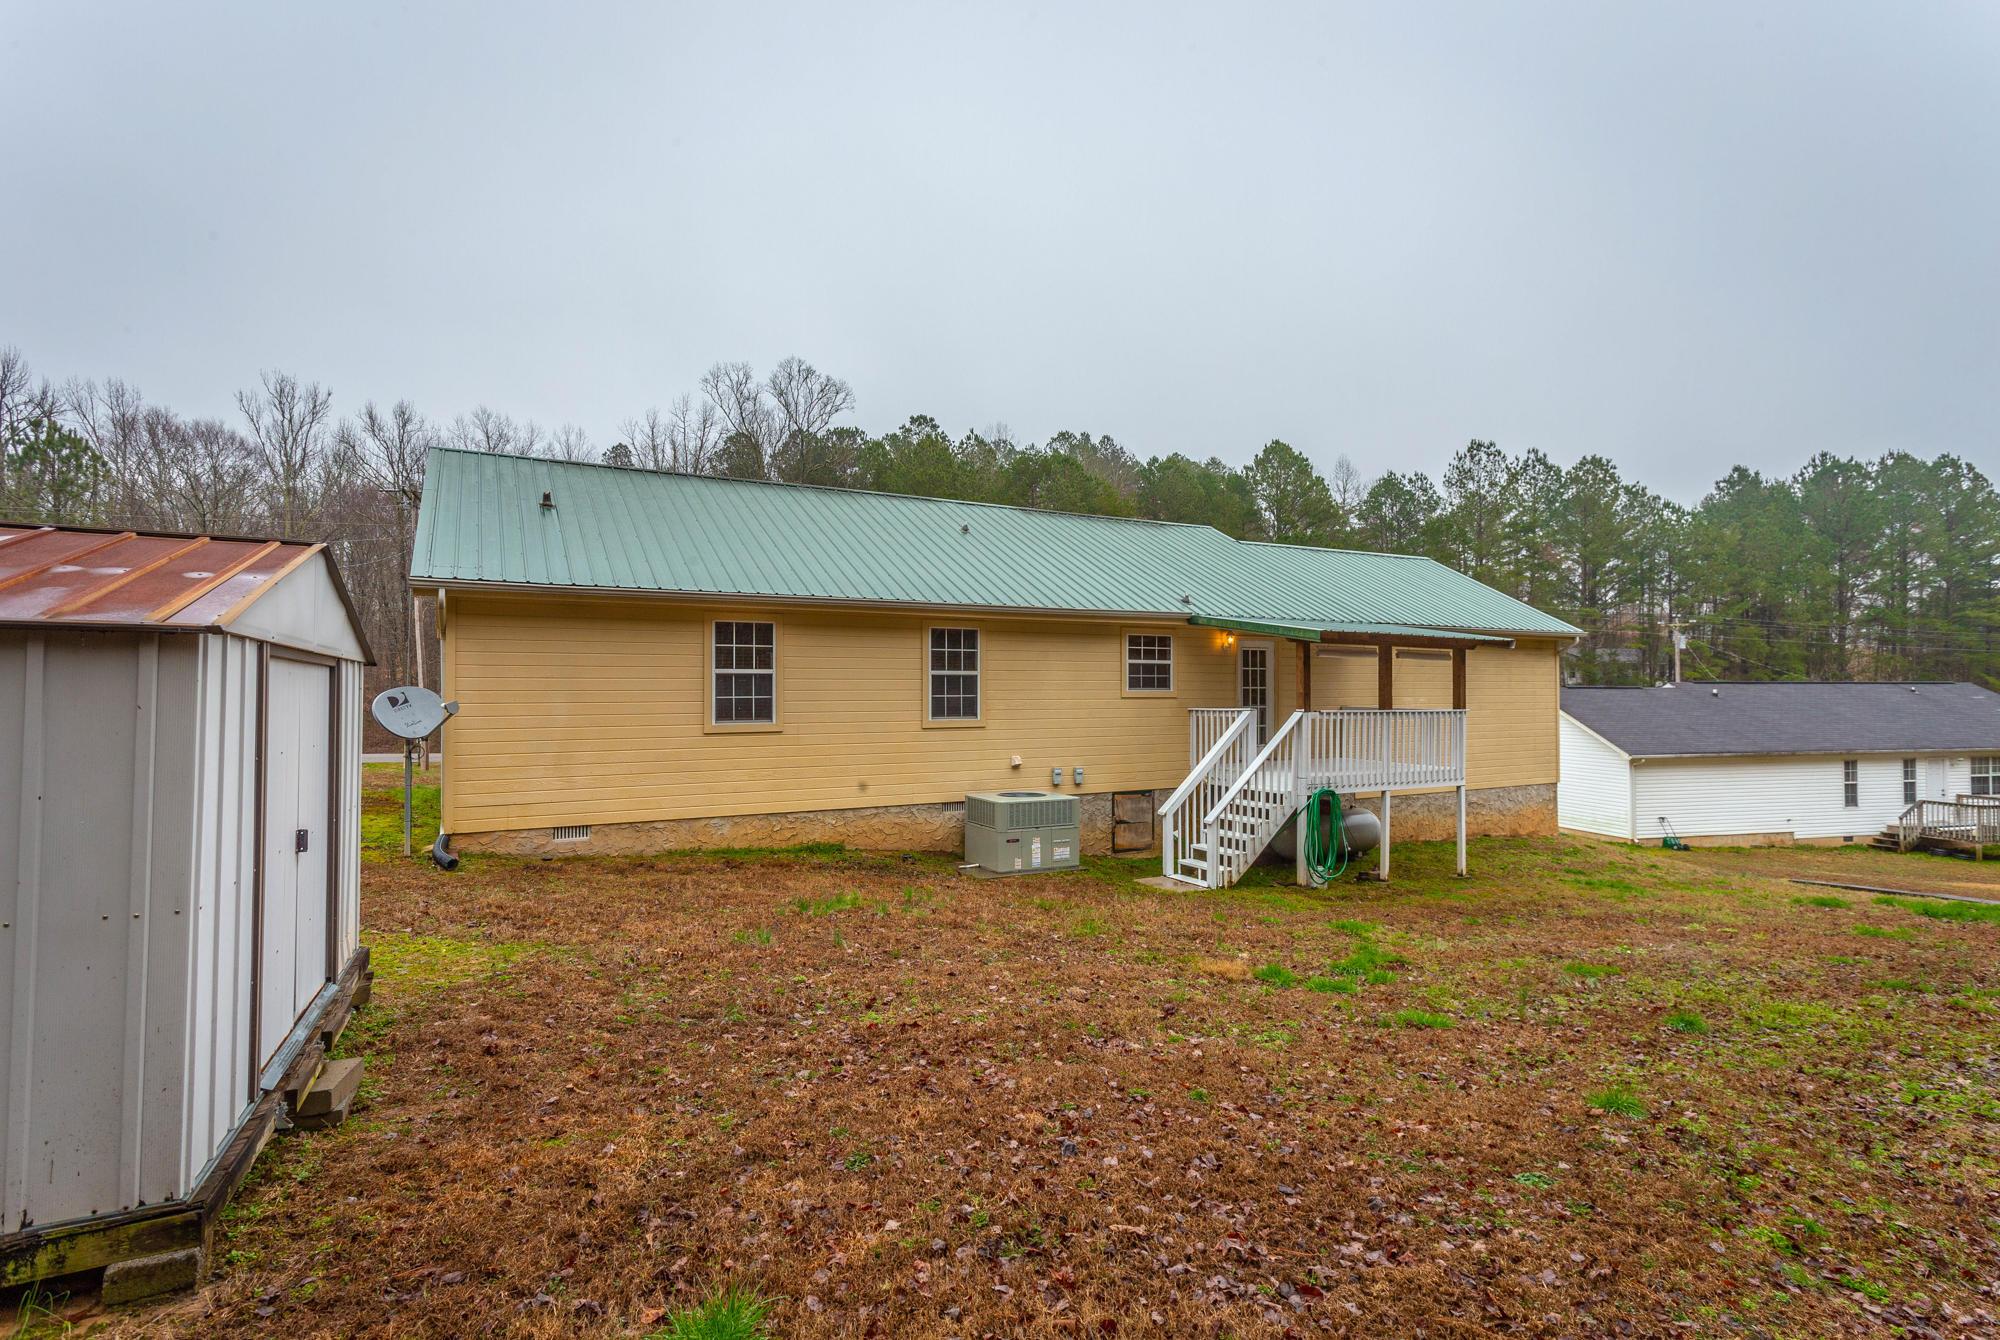 853 Keith Salem Rd, Ringgold, GA 30736